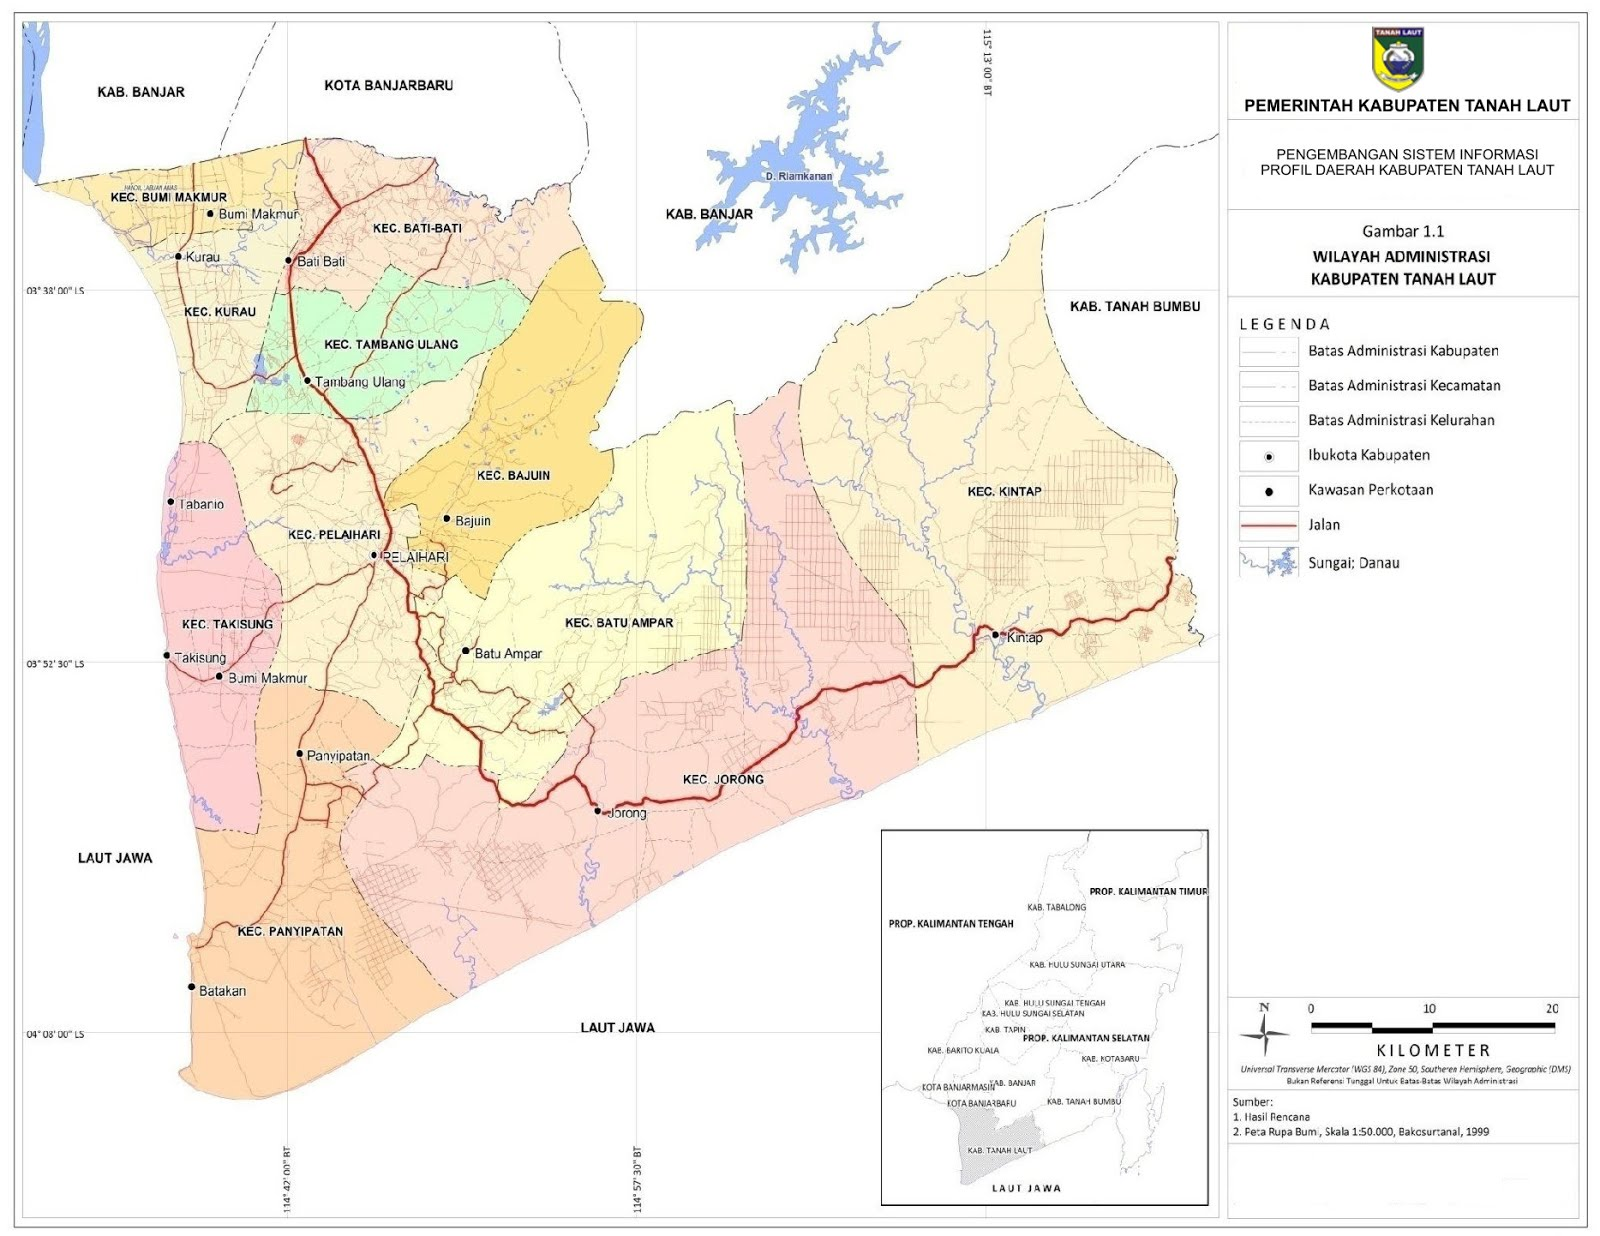 Peta Kabupaten Tanah Laut